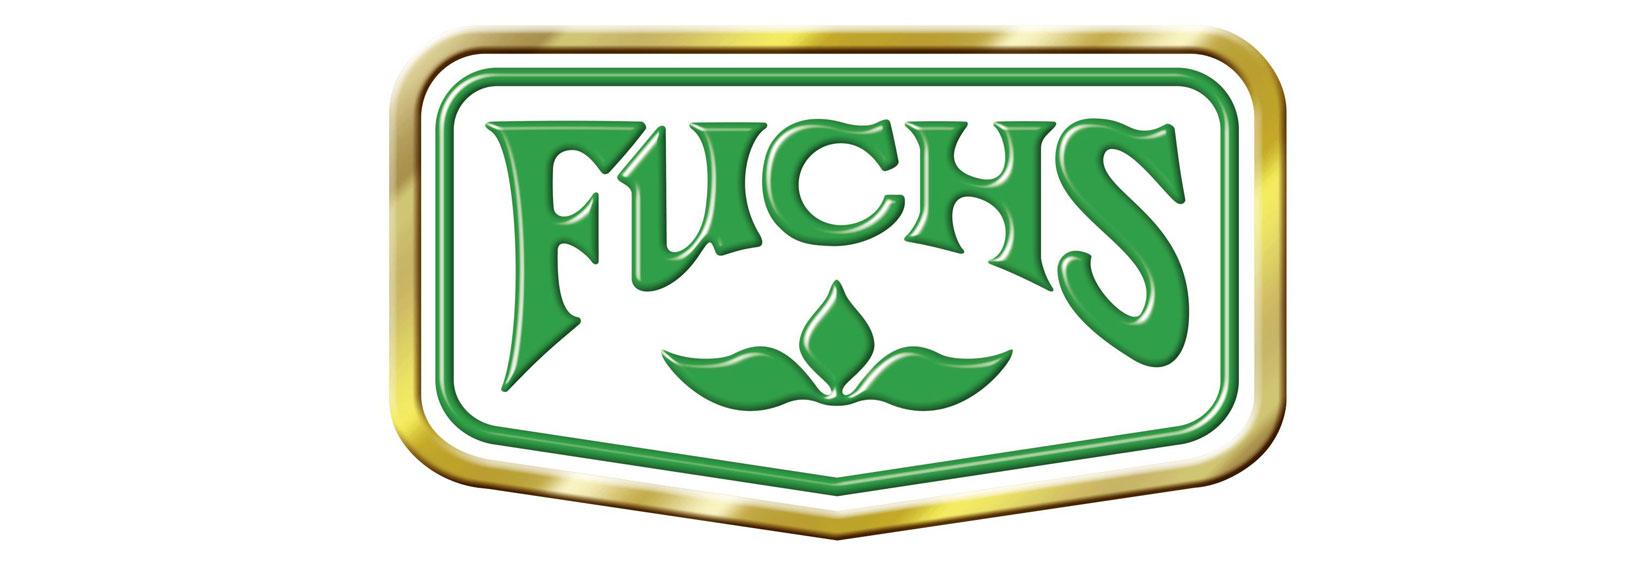 15-fuchs